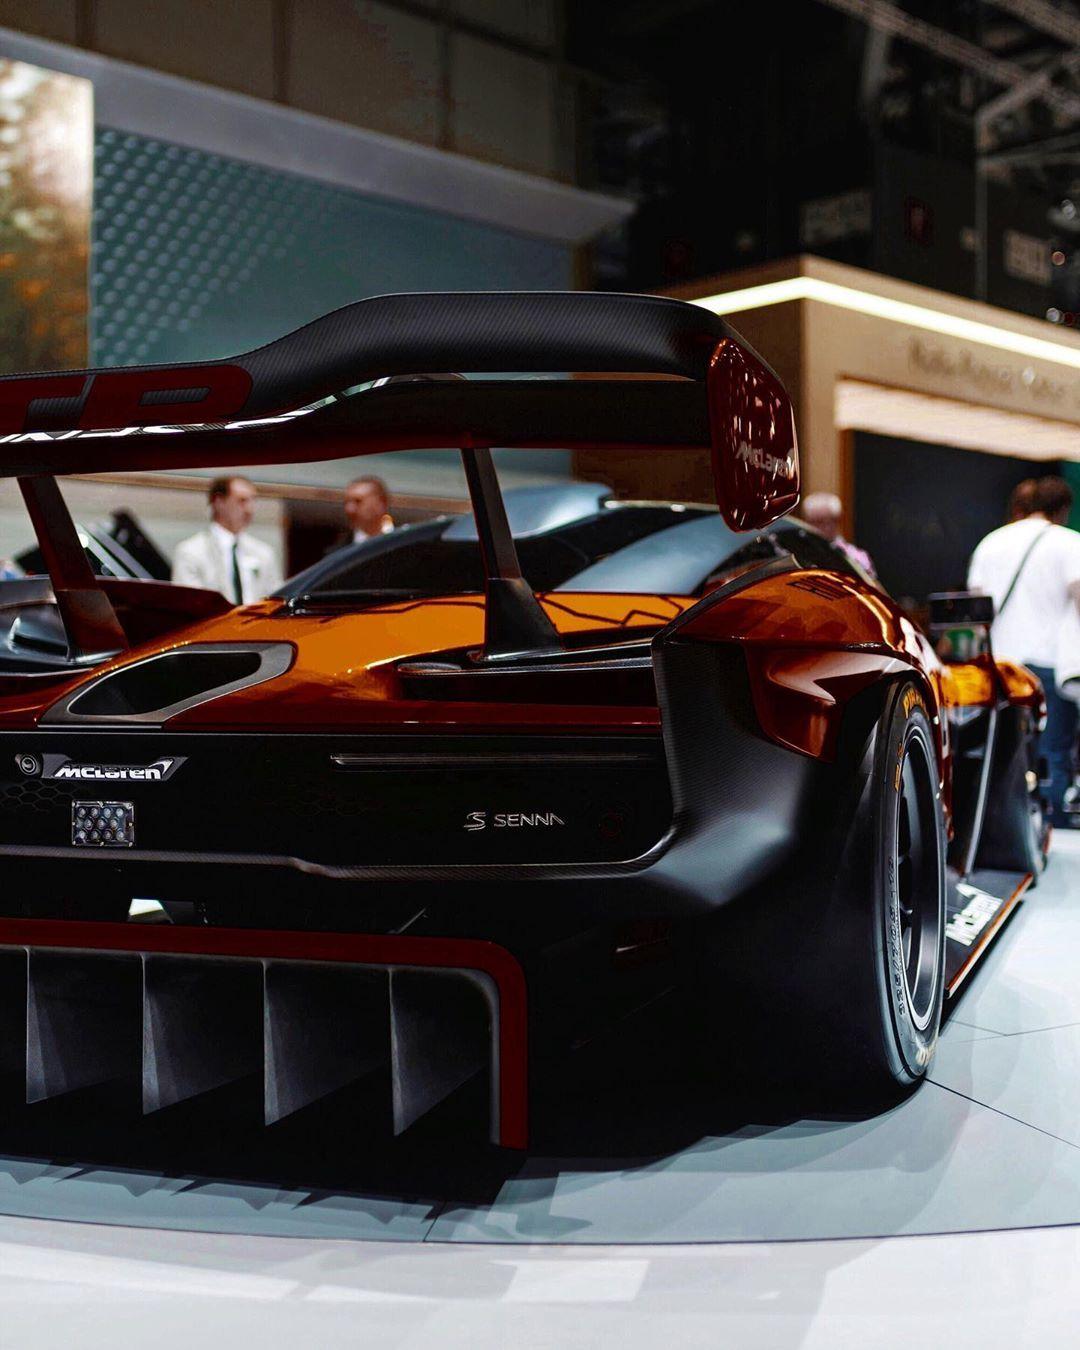 L�ks Otomobil Audi #cars #luxurycars #sportcars #conceptcars #motorcycles #trucks